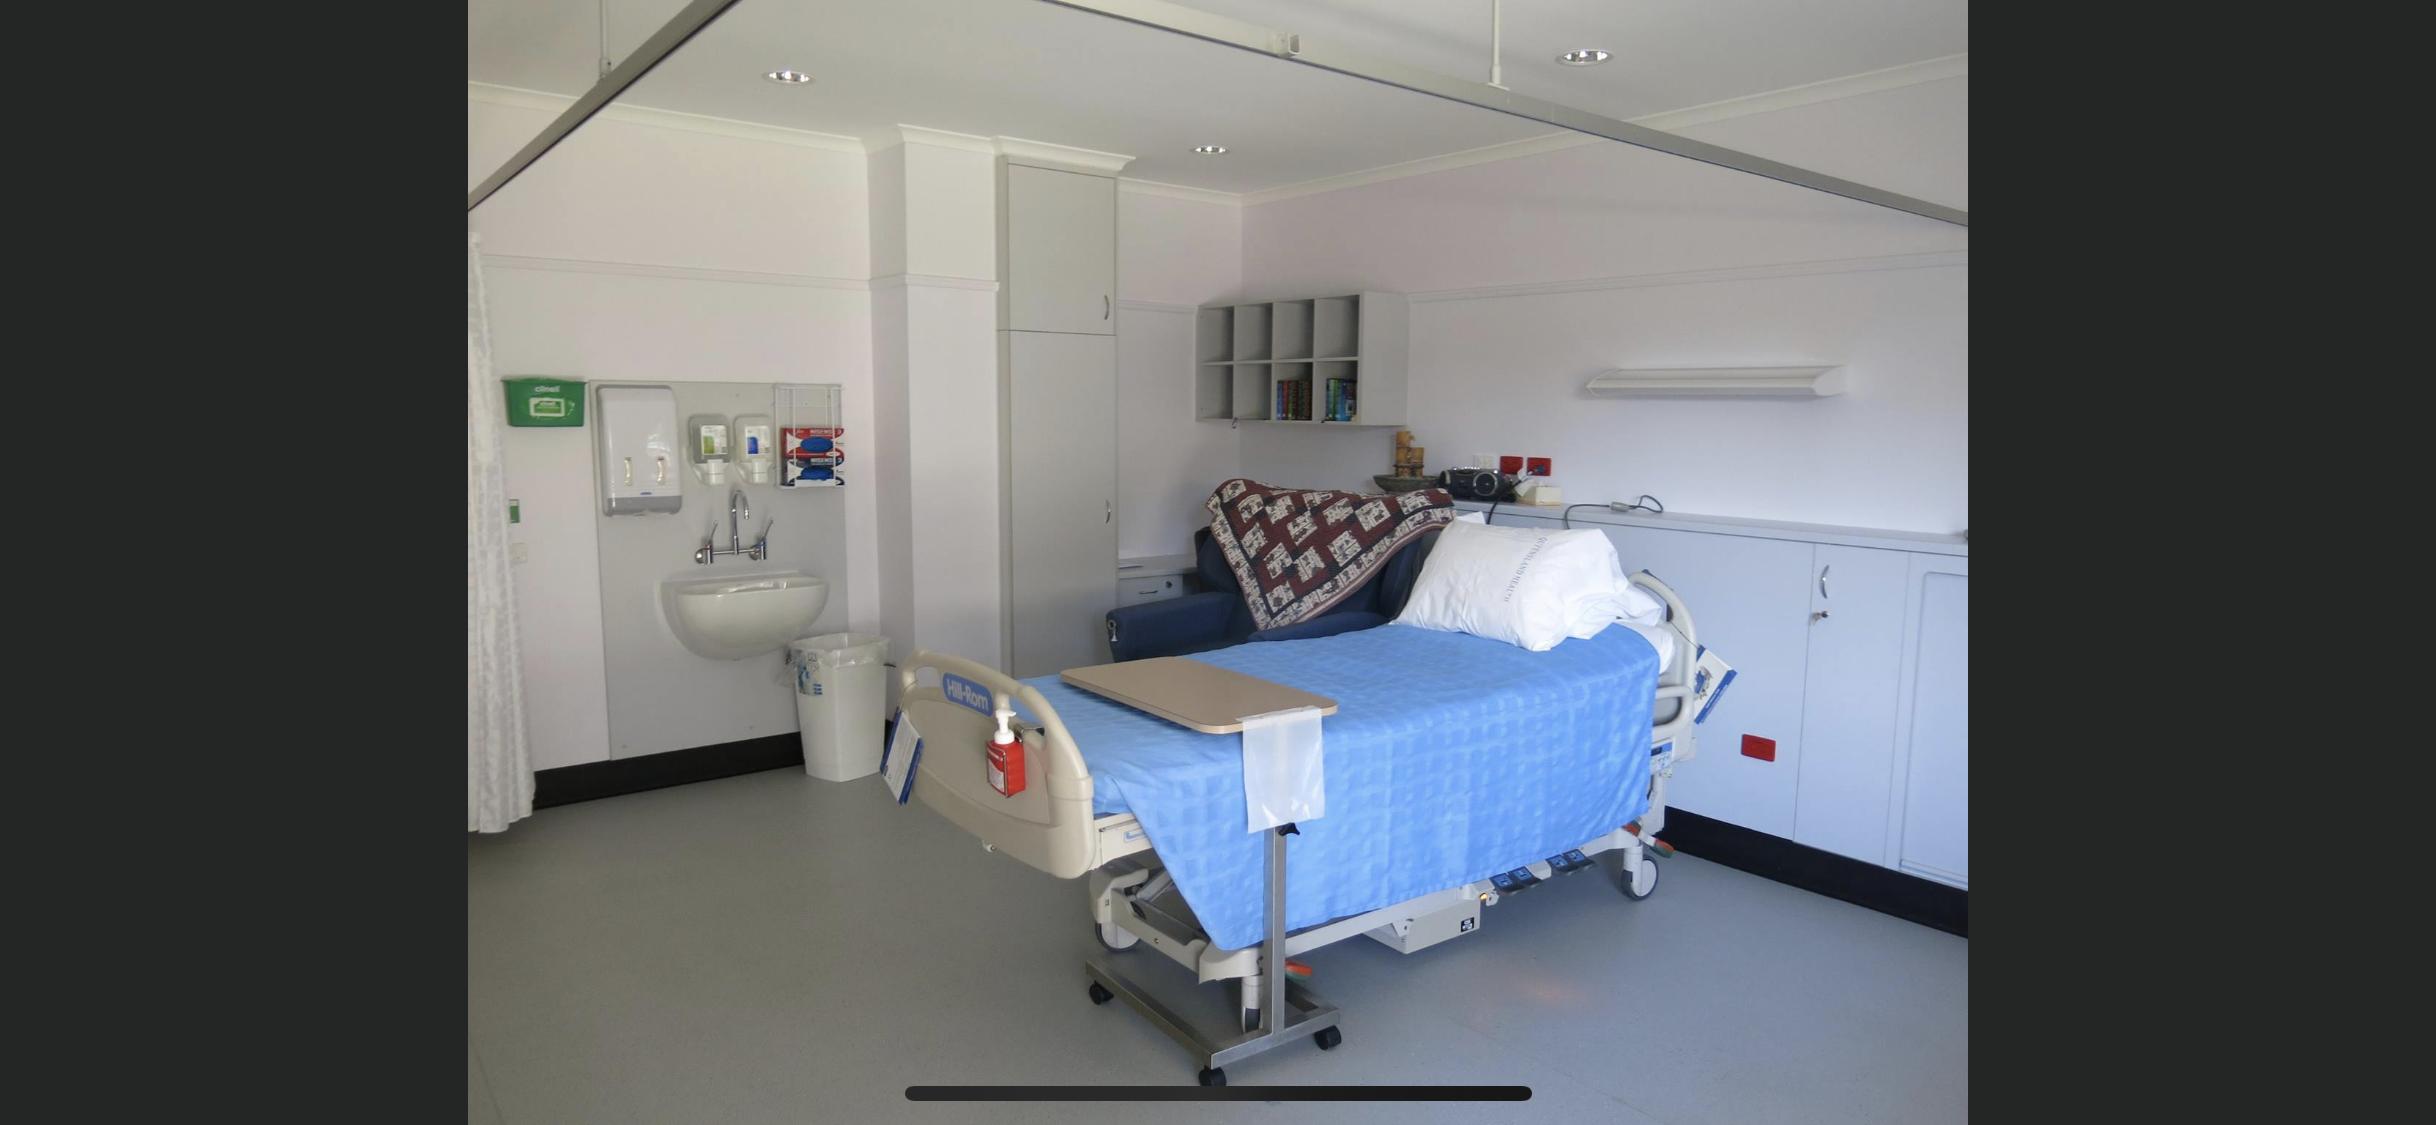 Palliative Care Ward